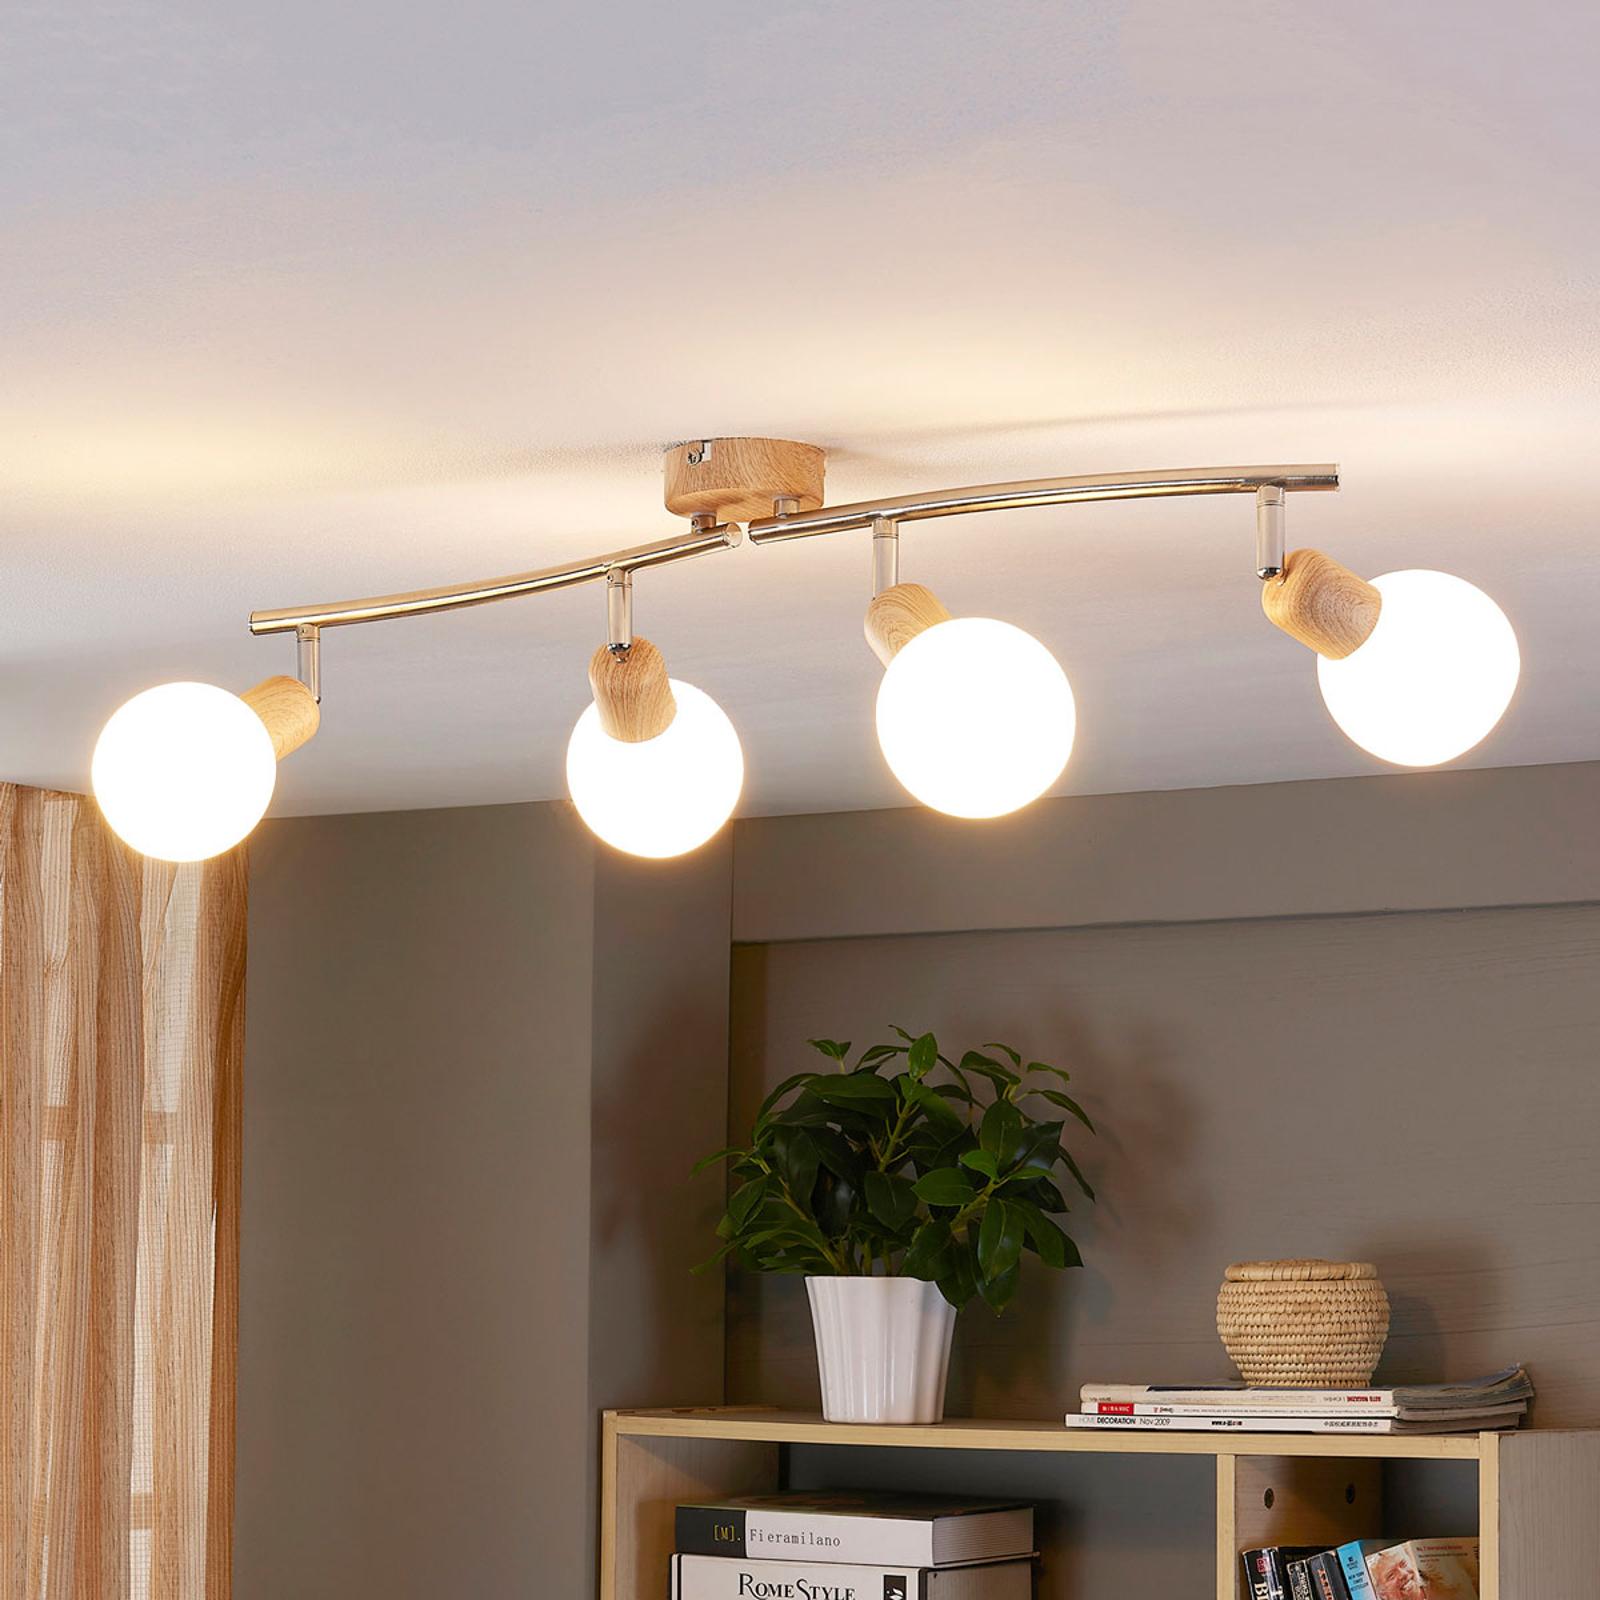 Plafoniera LED quadrilampada Svenka, look legno